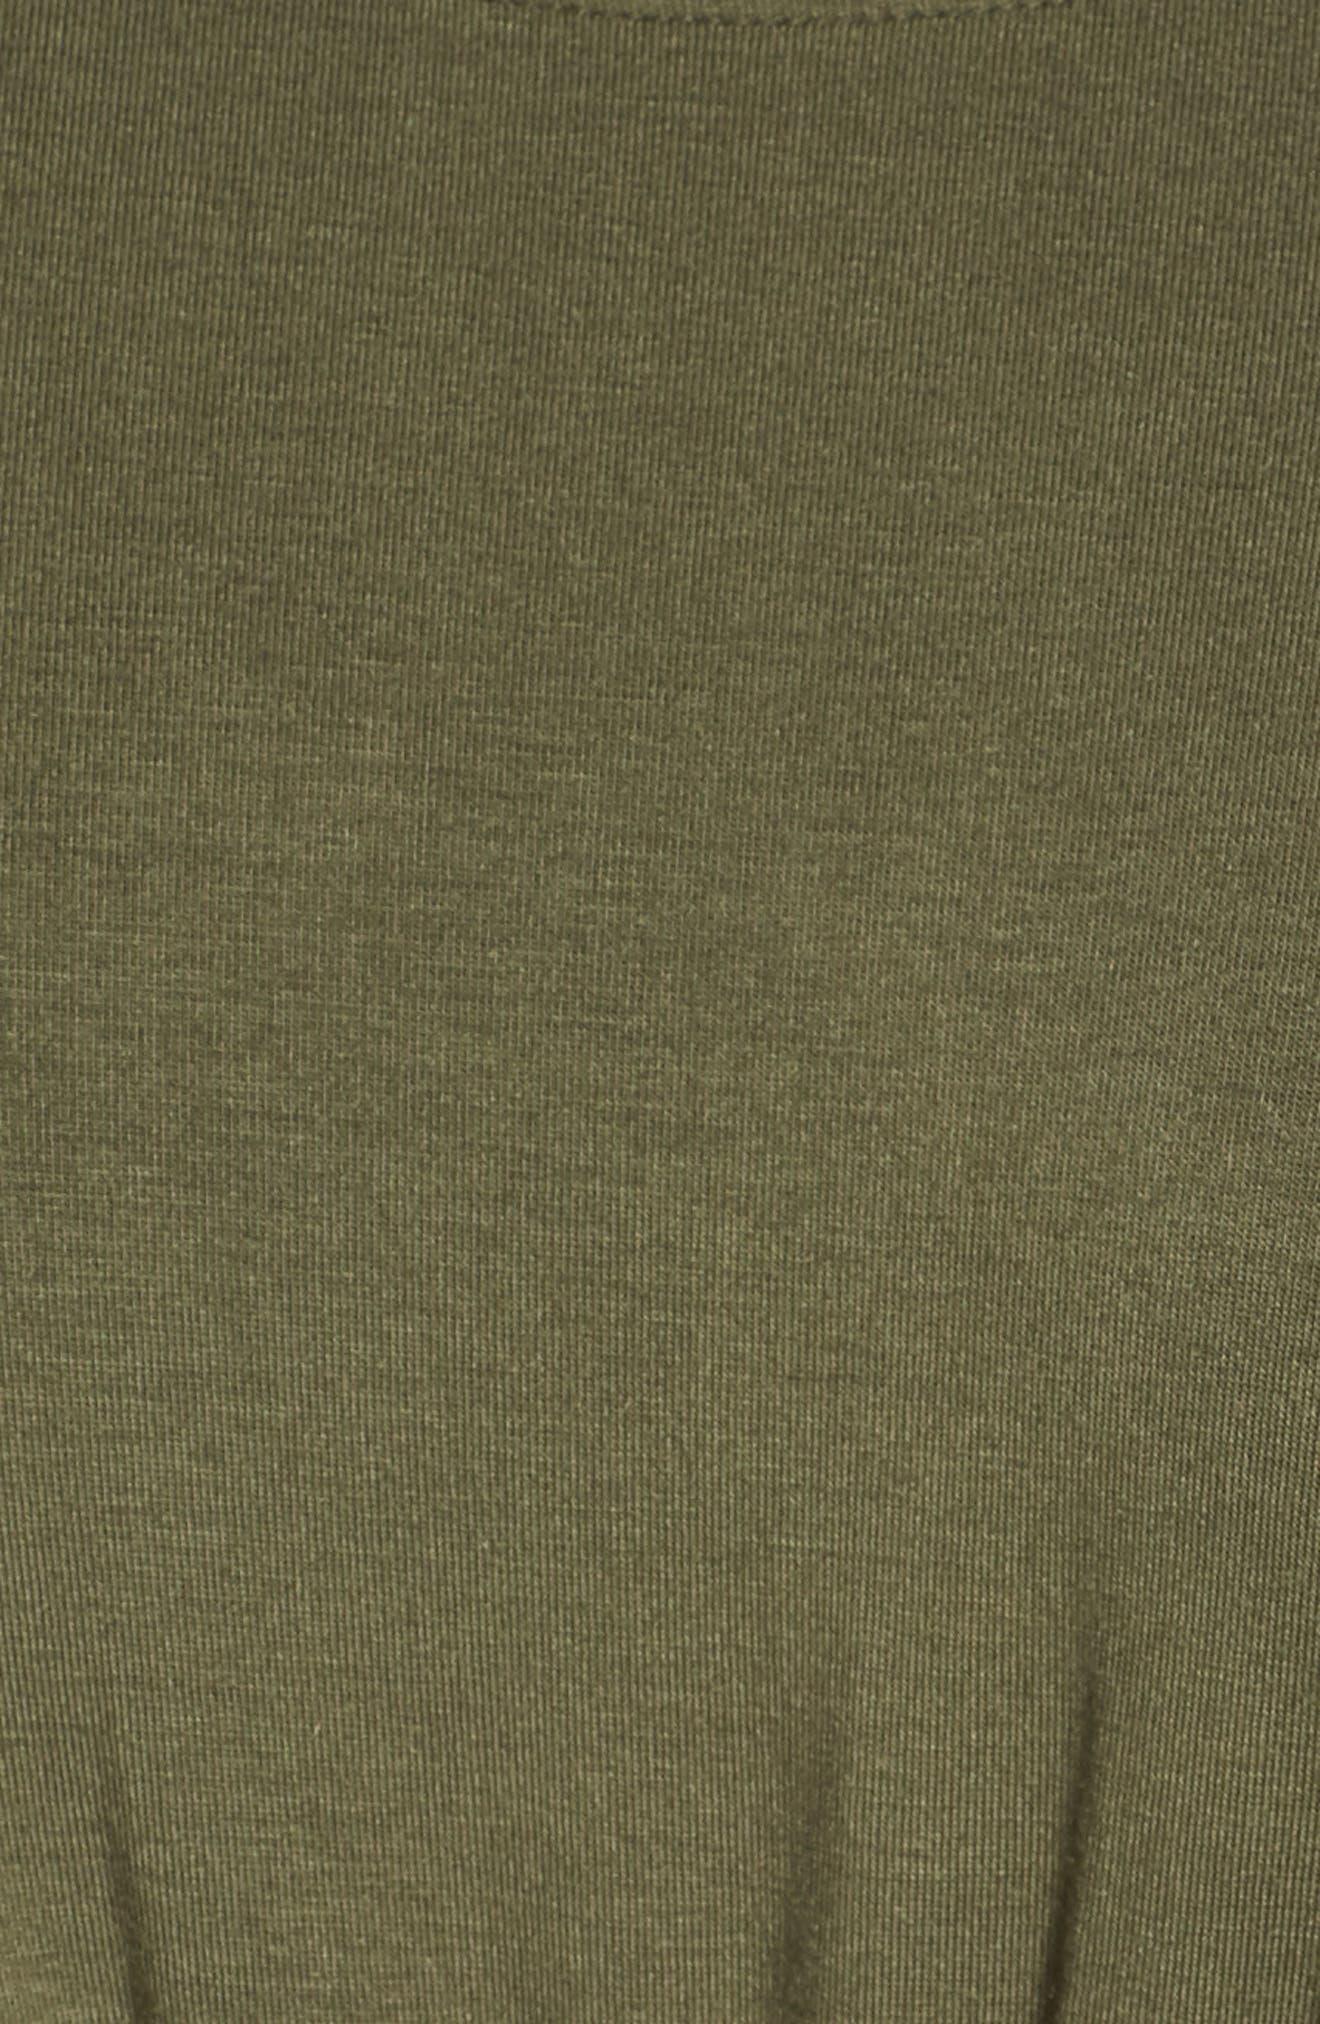 Gathered Waist Knit Top,                             Alternate thumbnail 5, color,                             OLIVE SARMA